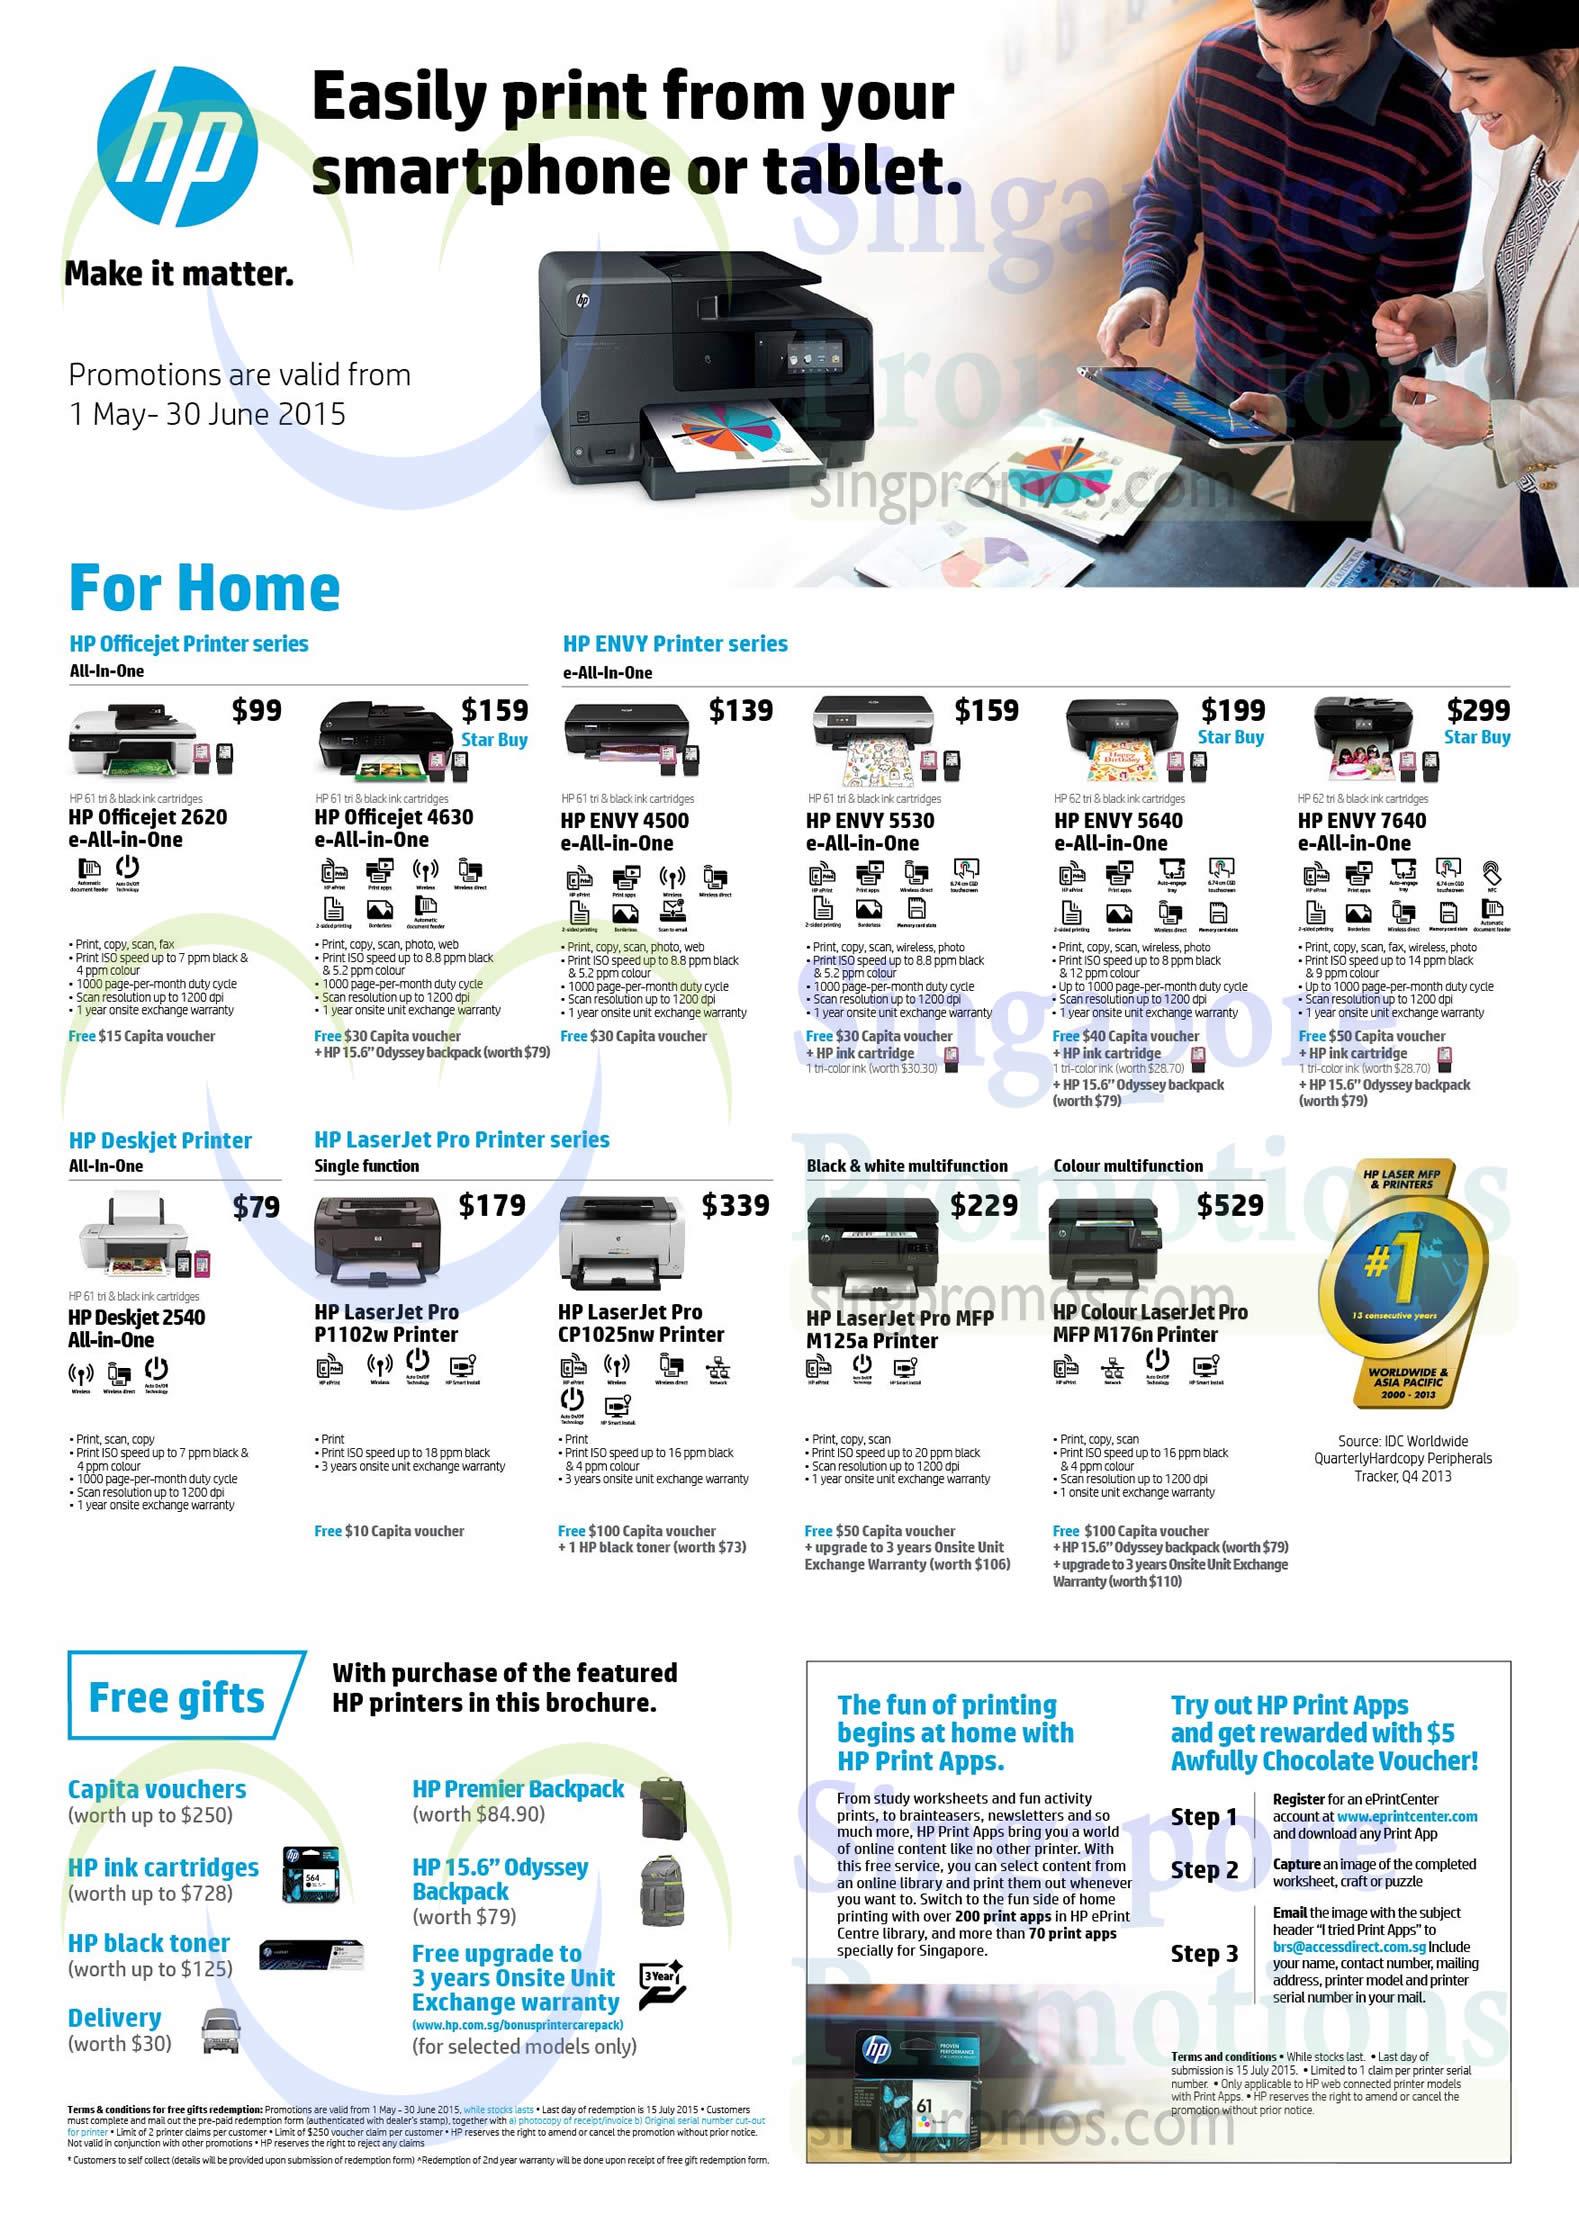 HP Officejet 2620 Printer, HP Officejet 4630 Printer, HP Envy 4500 Printer, HP Envy 5530 Printer, HP Envy 5640 Printer, HP Envy 7640 Printer, HP Deskjet 2540 Printer, HP LaserJet Pro P1102w Printer, HP LaserJet Pro CP1025nw Printer, HP LaserJet Pro MFP M125a Printer, HP Colour LaserJet Pro MFP M176n Printer